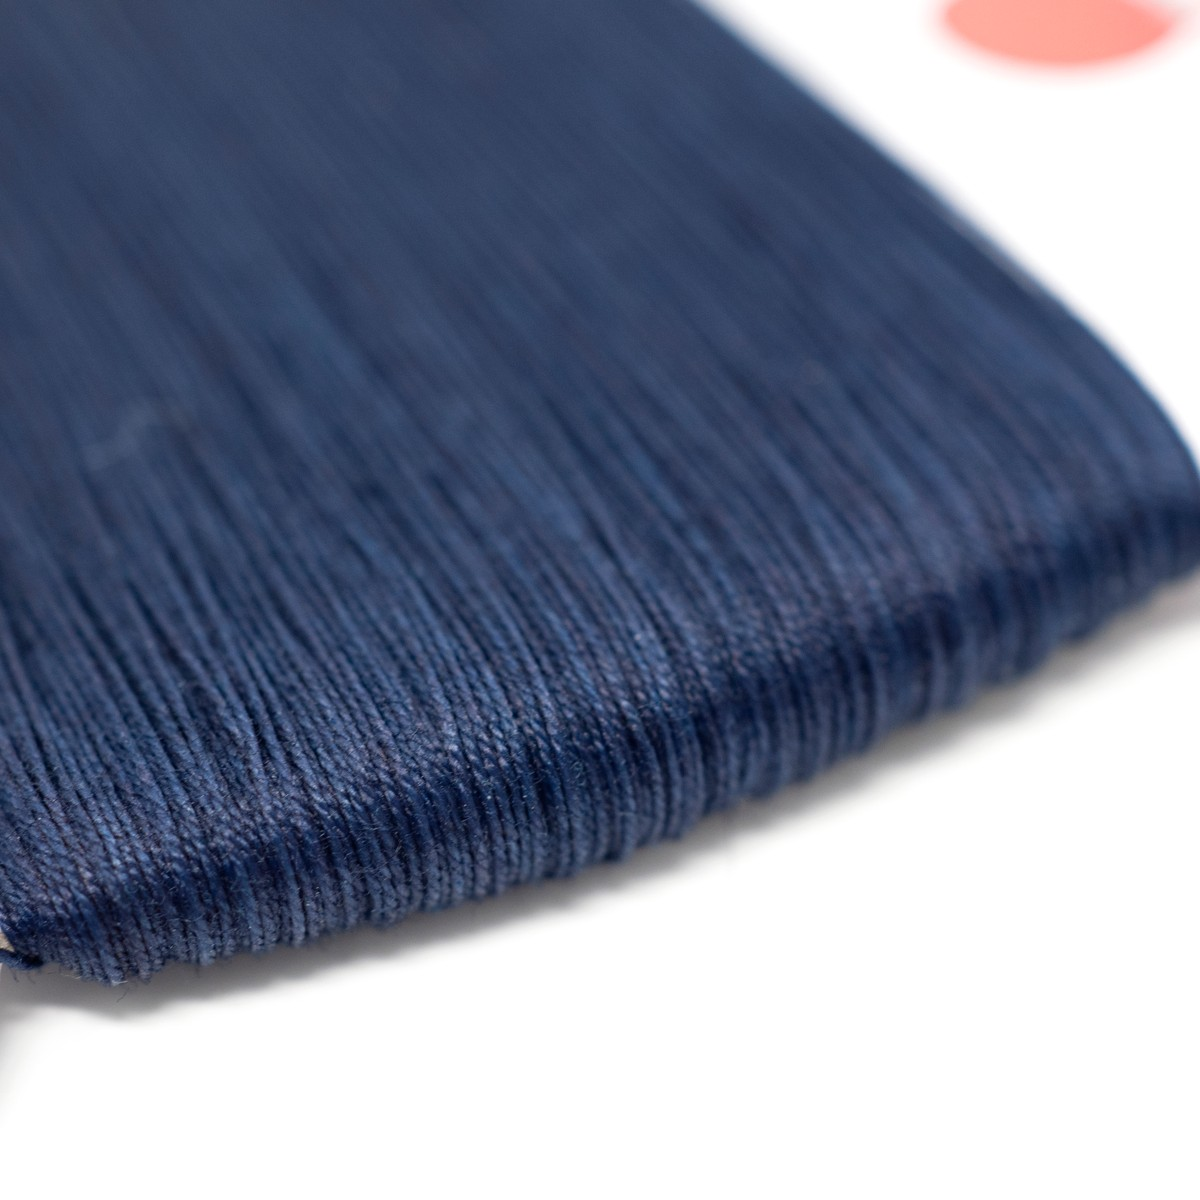 Photo of BUAISOU Sewing Thread: Deep Blue Indigo